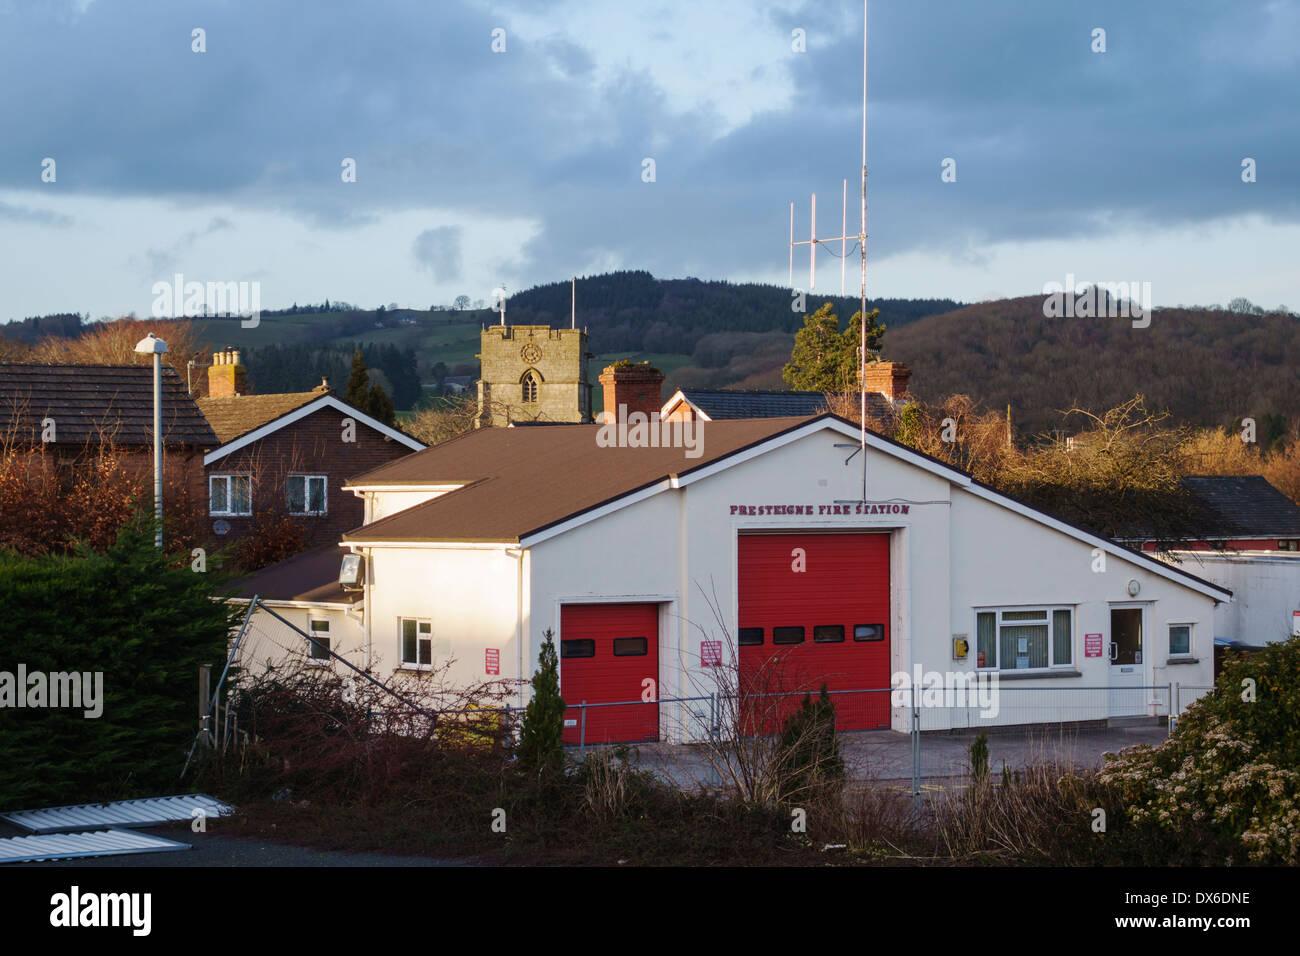 Presteigne, Powys, UK. The fire station - Stock Image